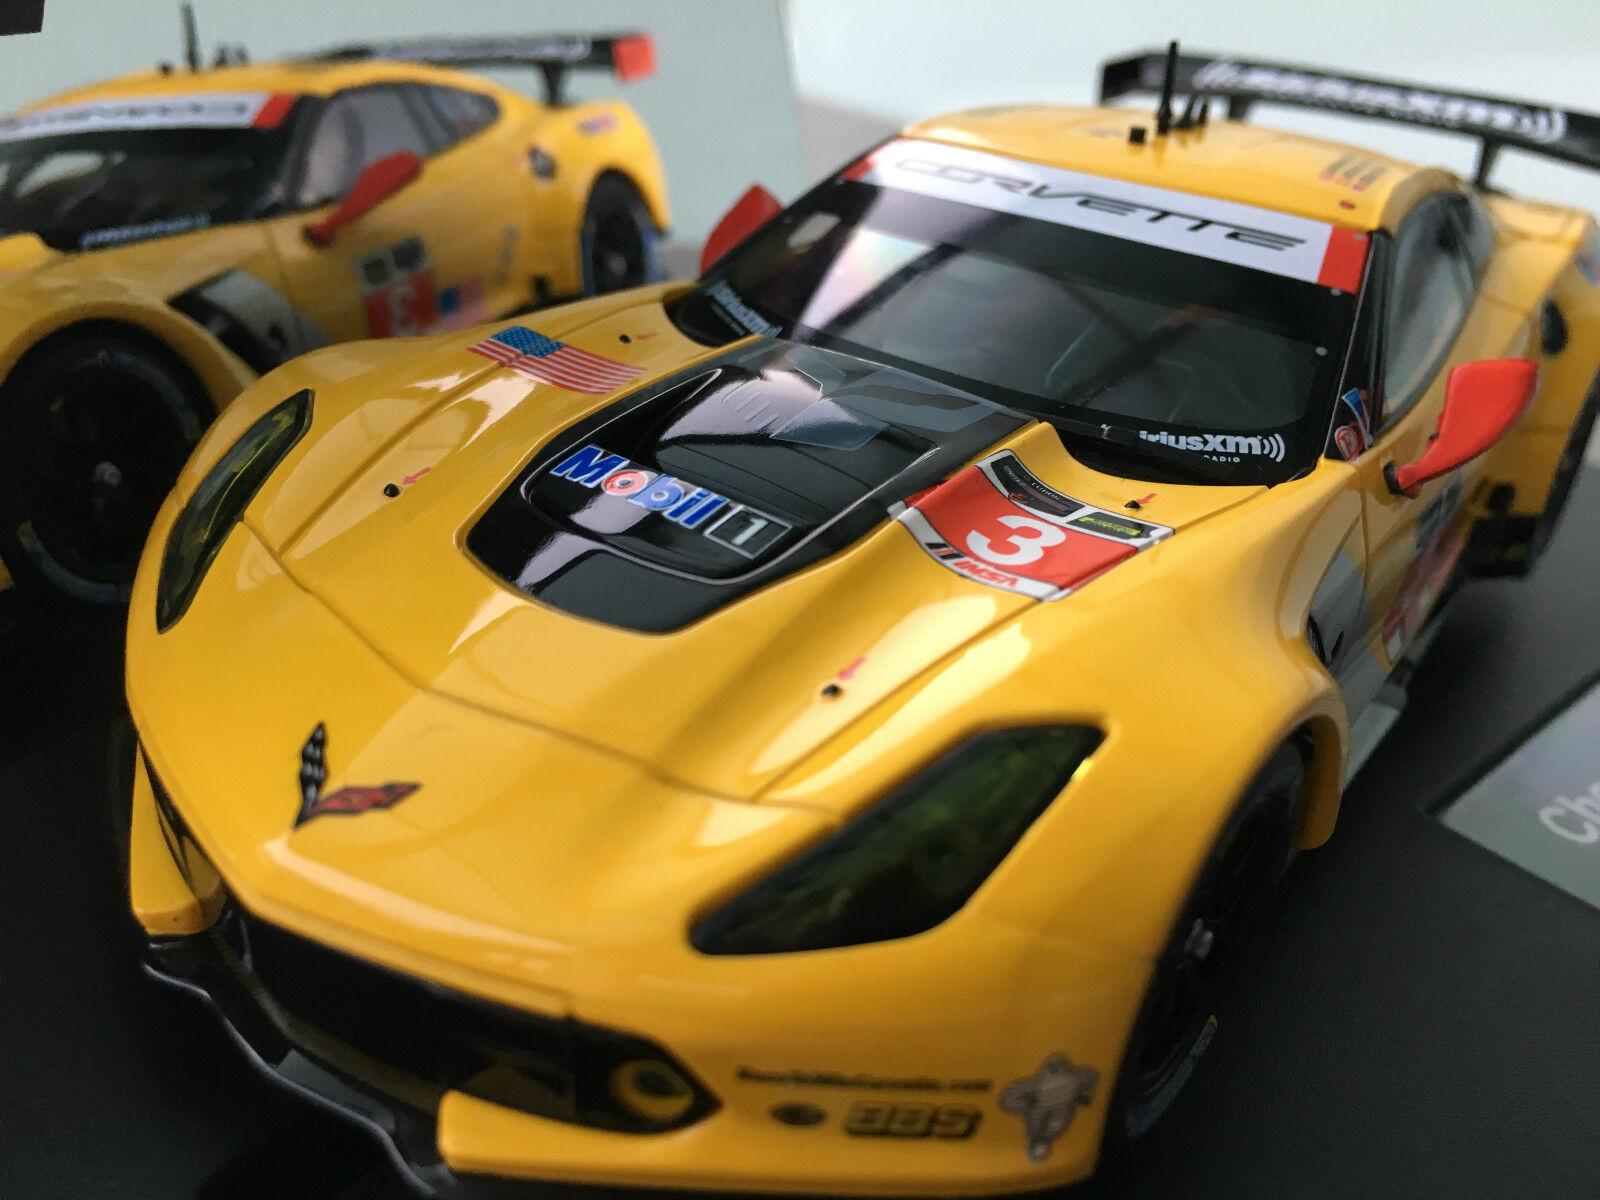 Carrera Evolution 27469 Chevrolet Corvette C7.R  No. 3  NEU OVP  | Online Store